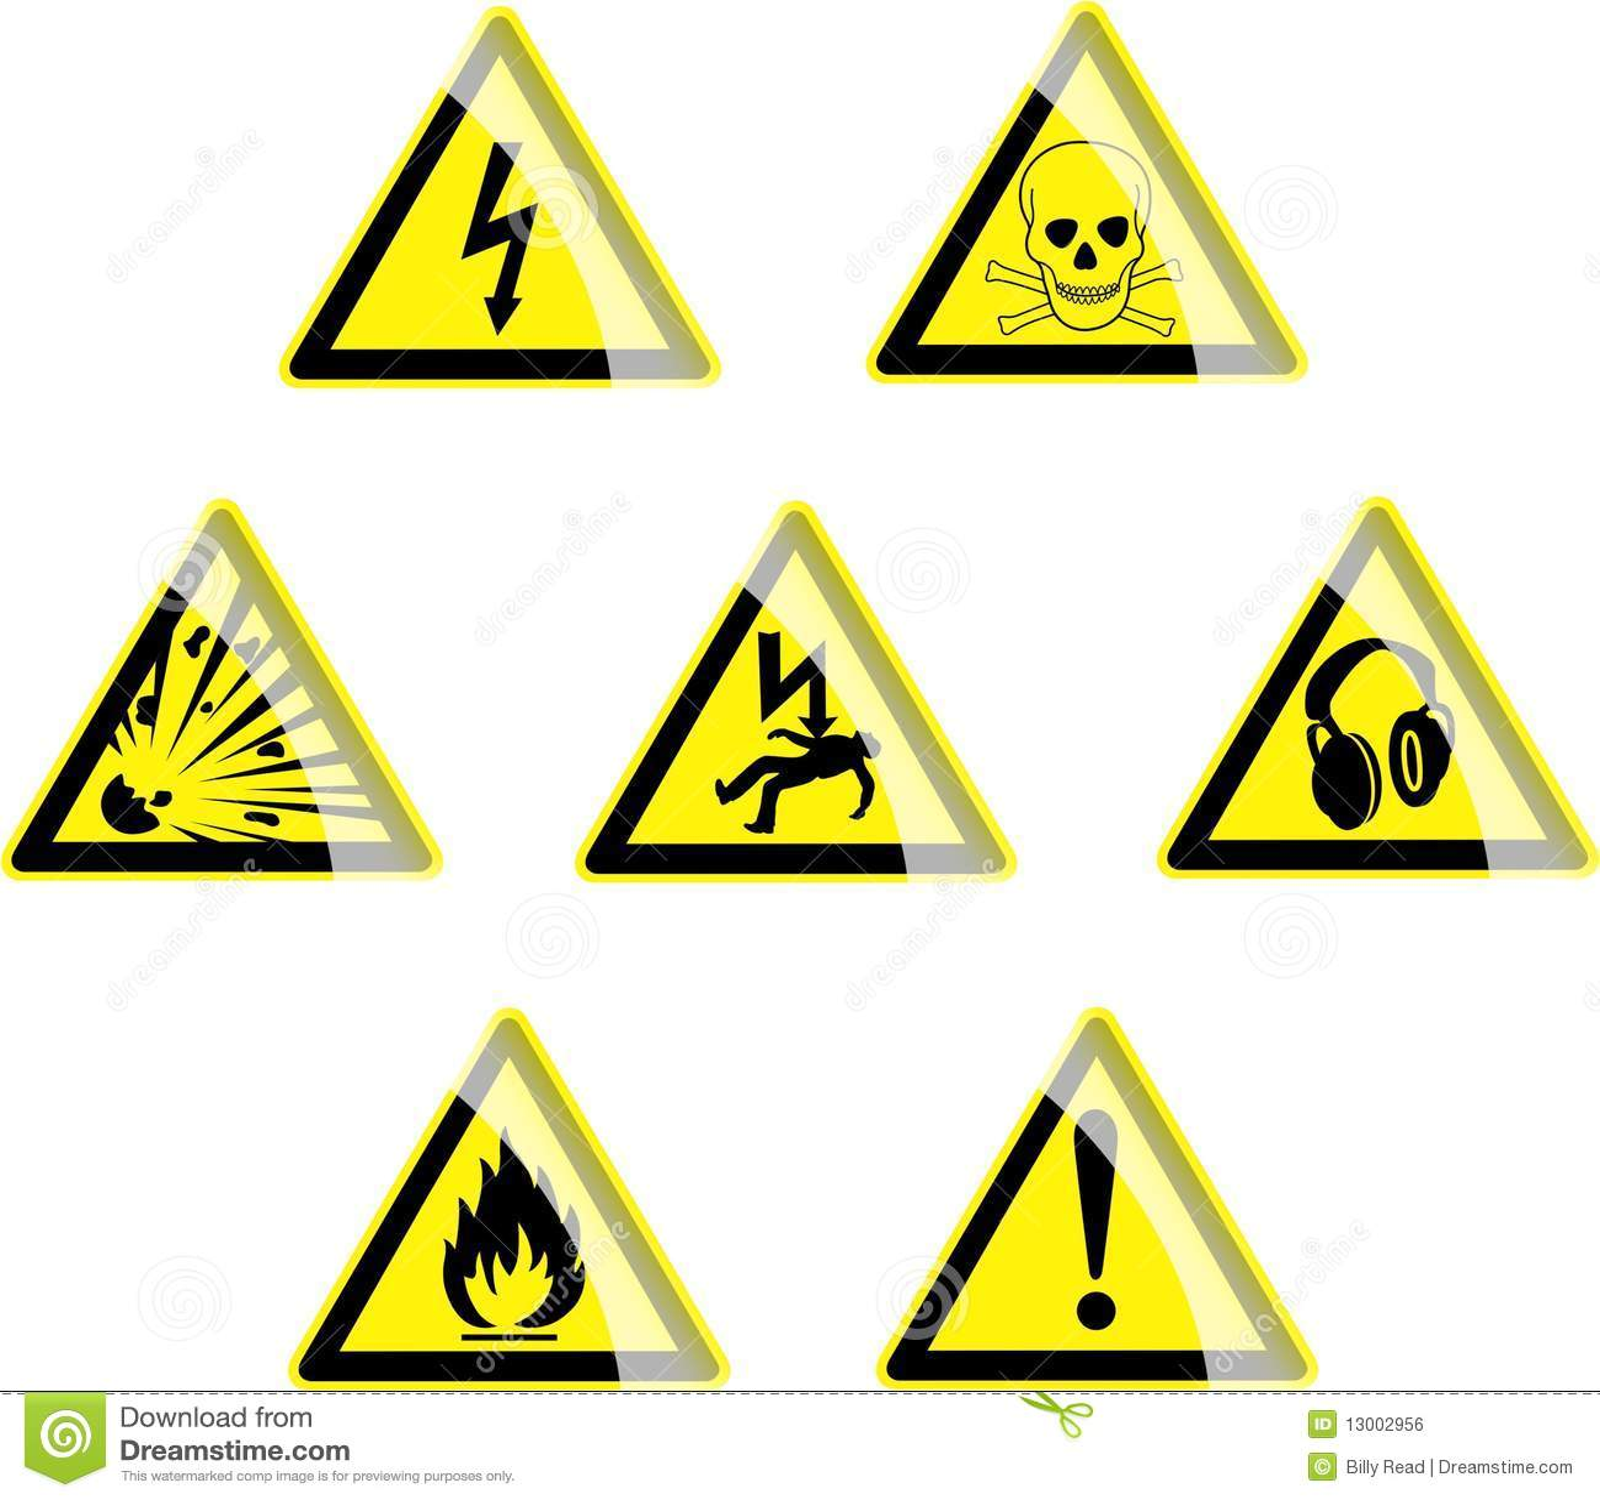 Hazard symbols stock vector illustration of background 13405505 hazard symbols royalty free stock image buycottarizona